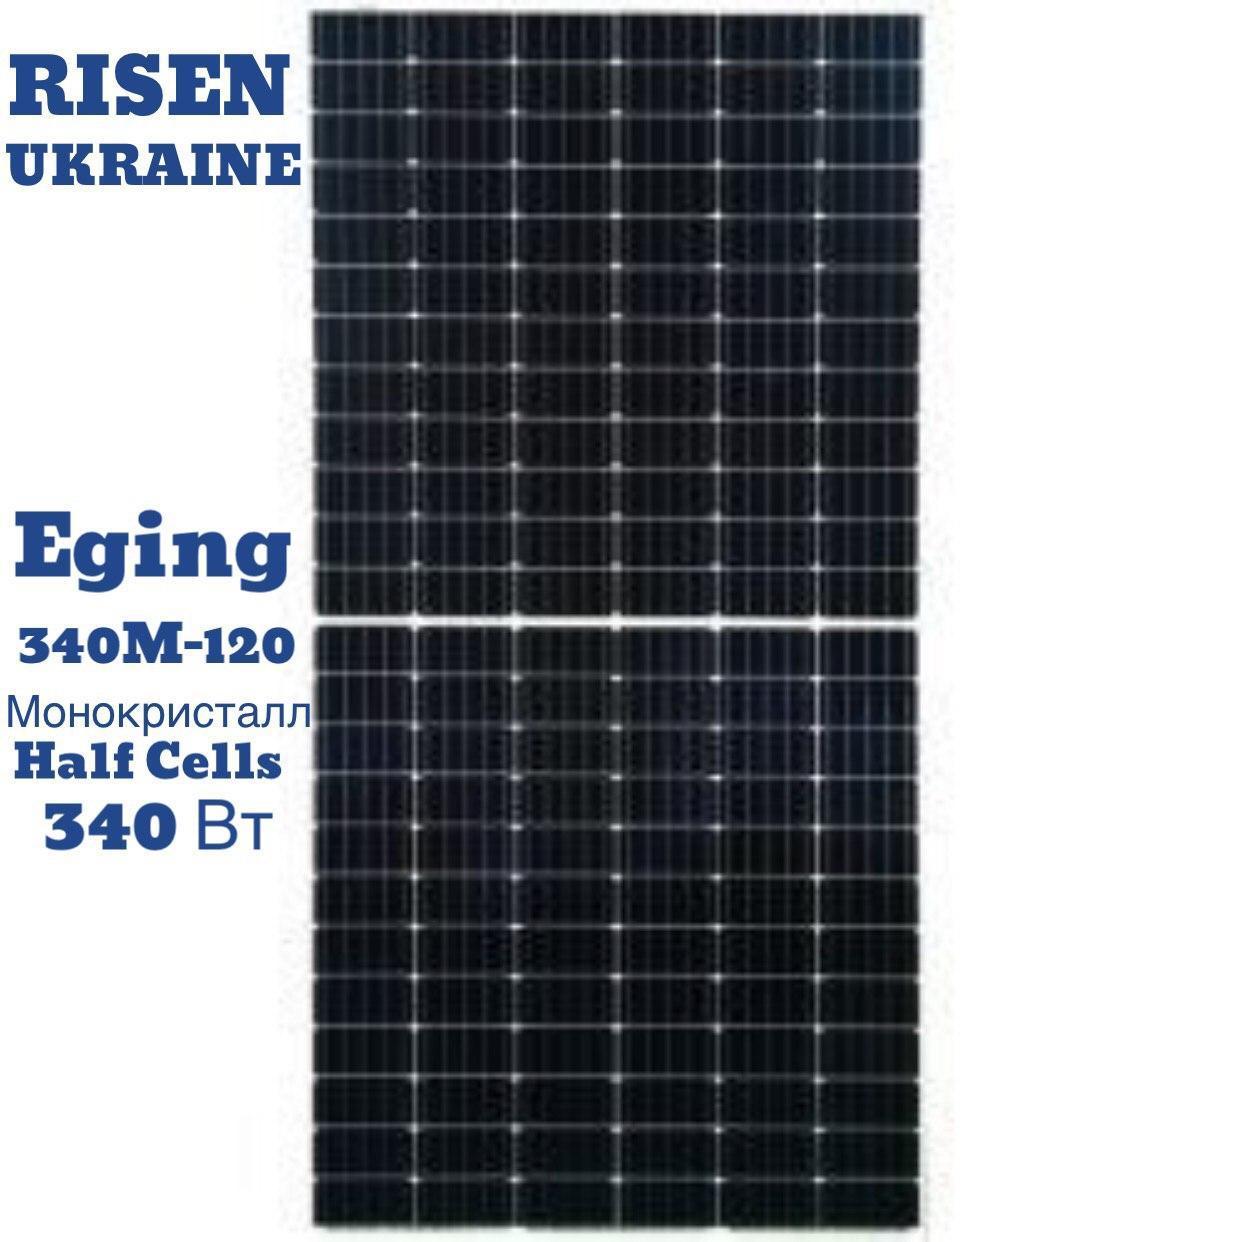 Солнечная батарея Eging EG-M120-340W-HC TIER 1 монокристалл 340Вт